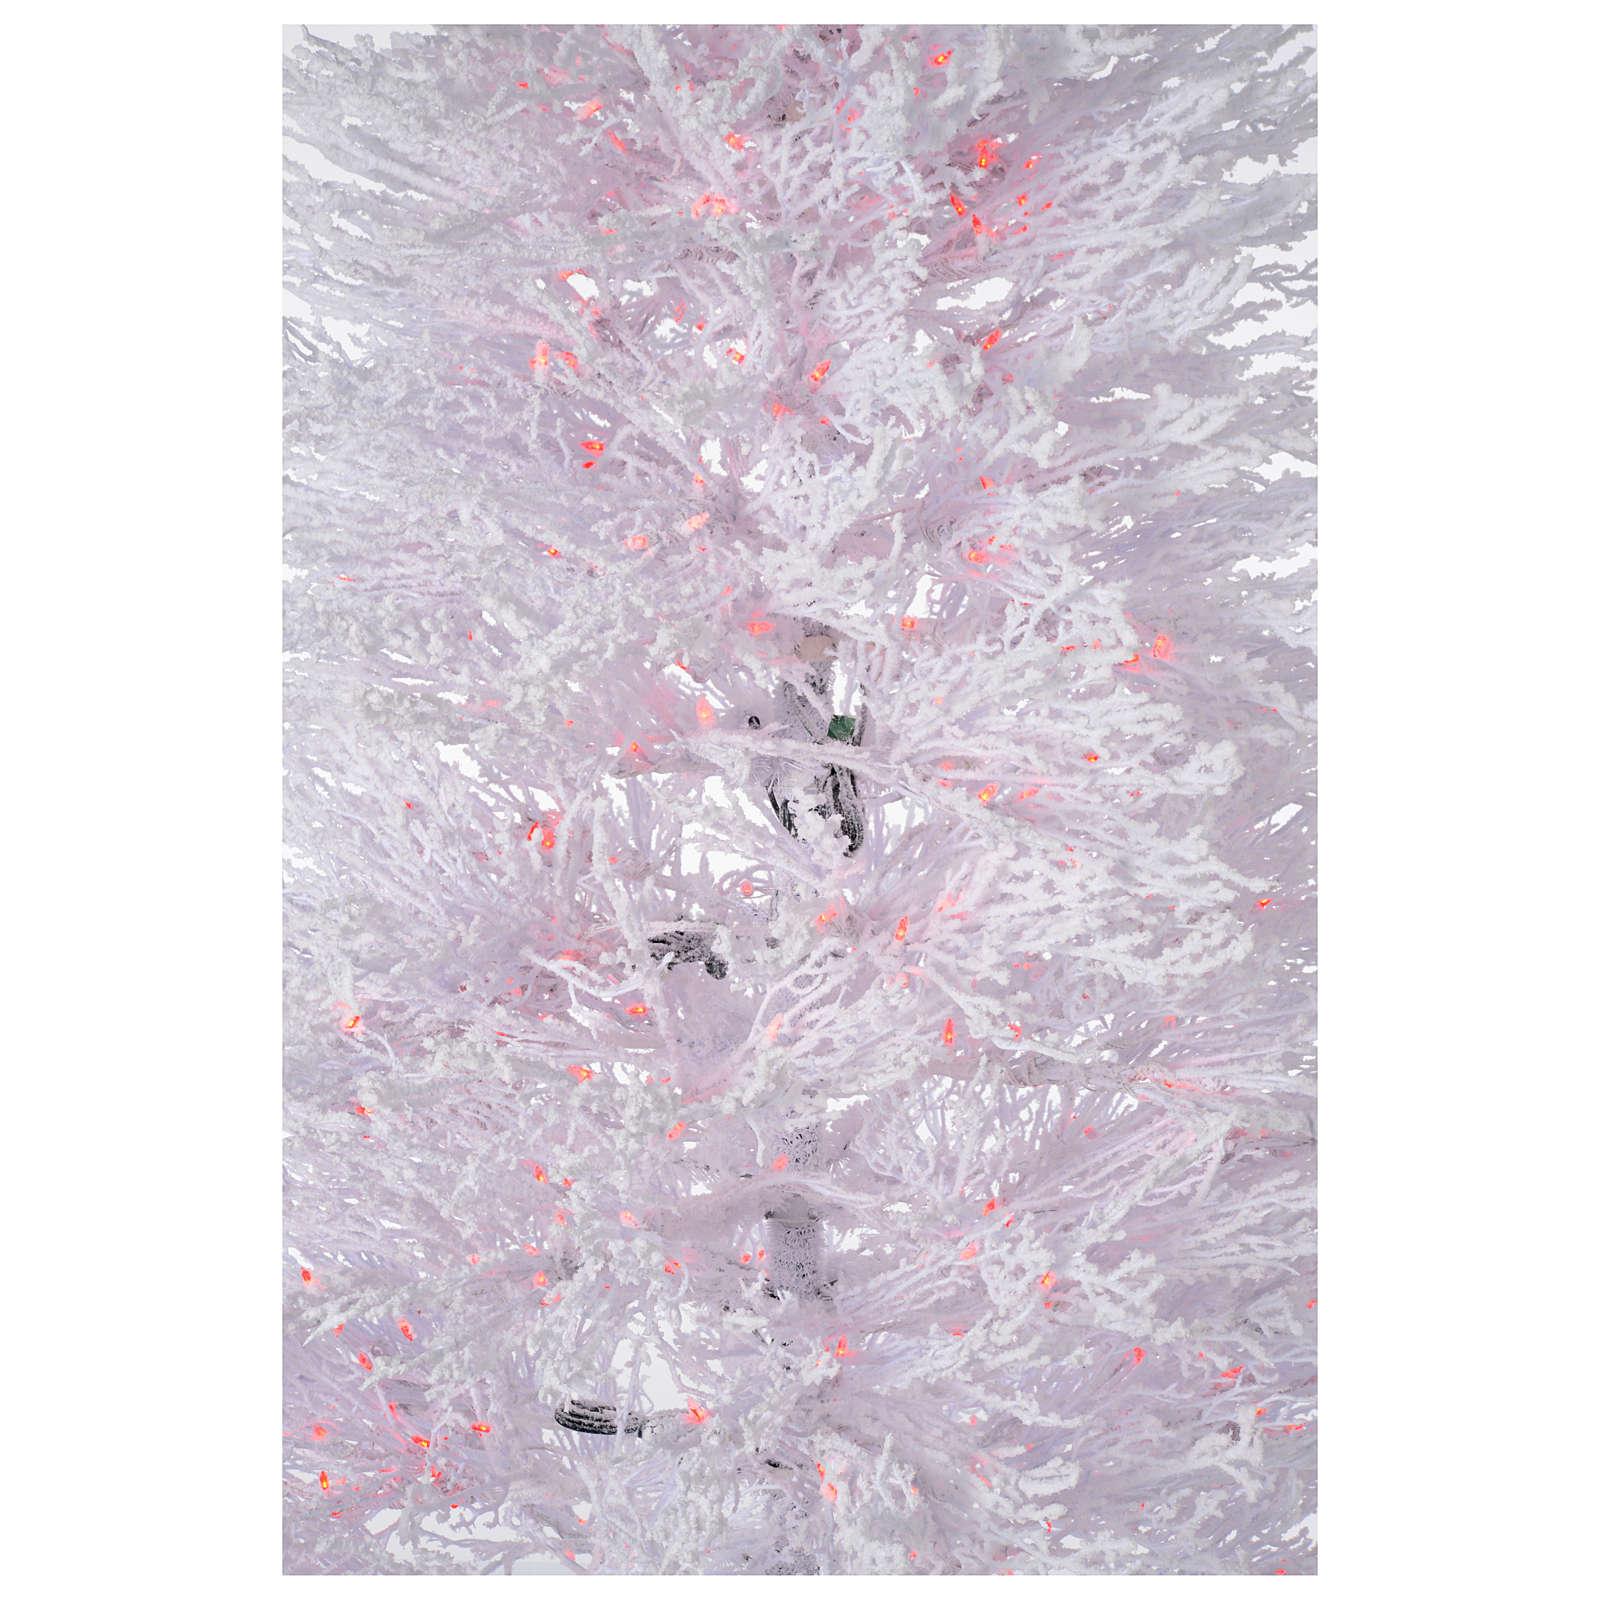 Árbol de Navidad con nieve blanco 270 cm luces rojas LED 700 modelo Winter Glamour 3